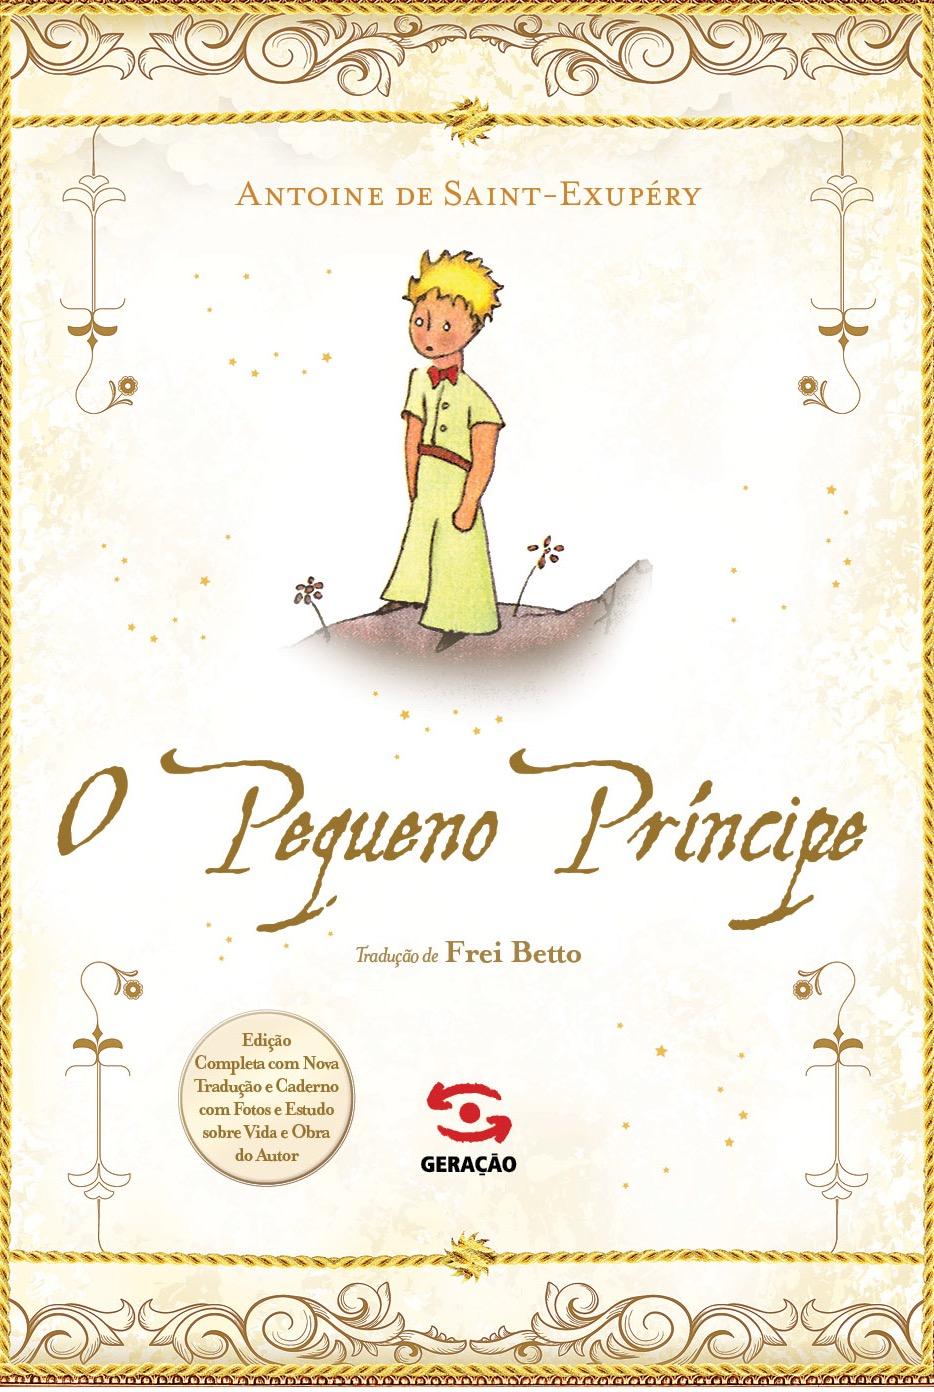 Resenha E Frases O Pequeno Príncipe Antoine De Saint Exupéry